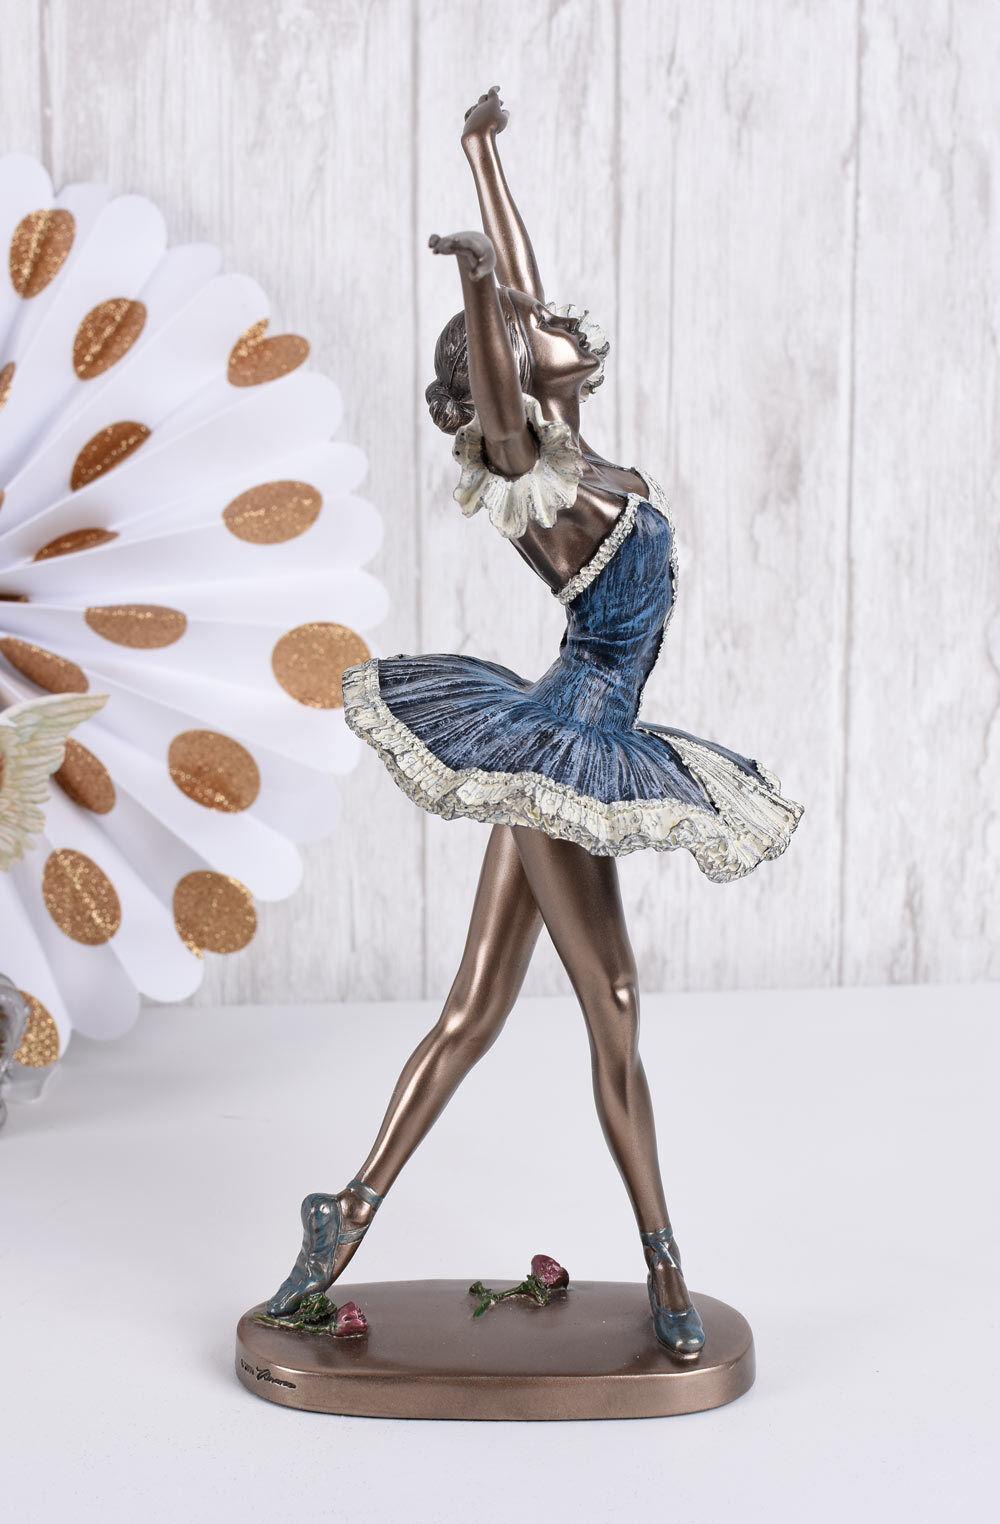 PRIMABALLERINA Bailarina Figura femenina Escultura Ballet FIRMADO